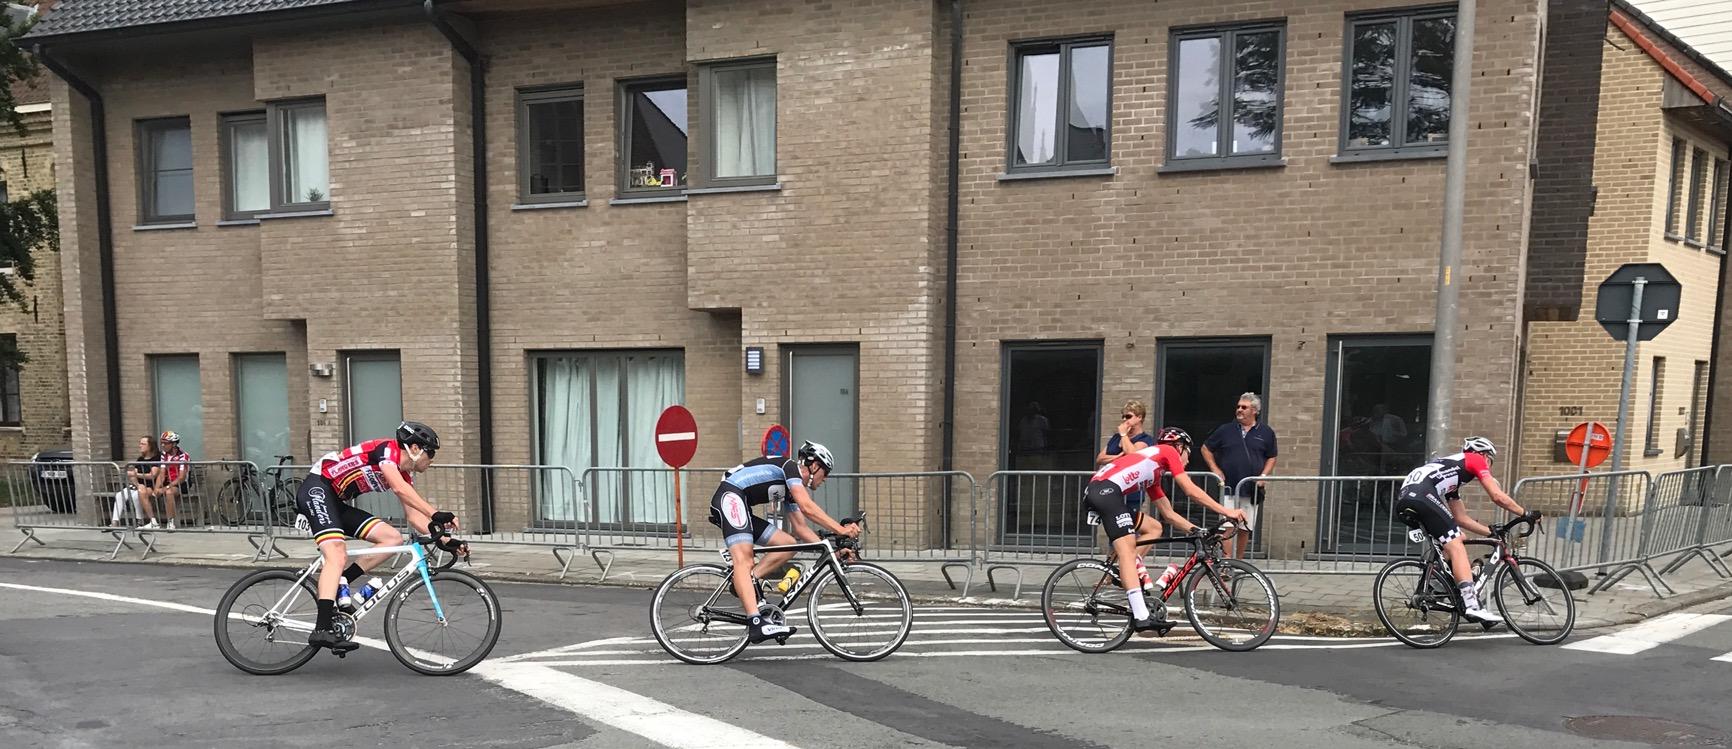 Diksmuide 17 - Peter Livingstone (red jersey) in the early breakaway